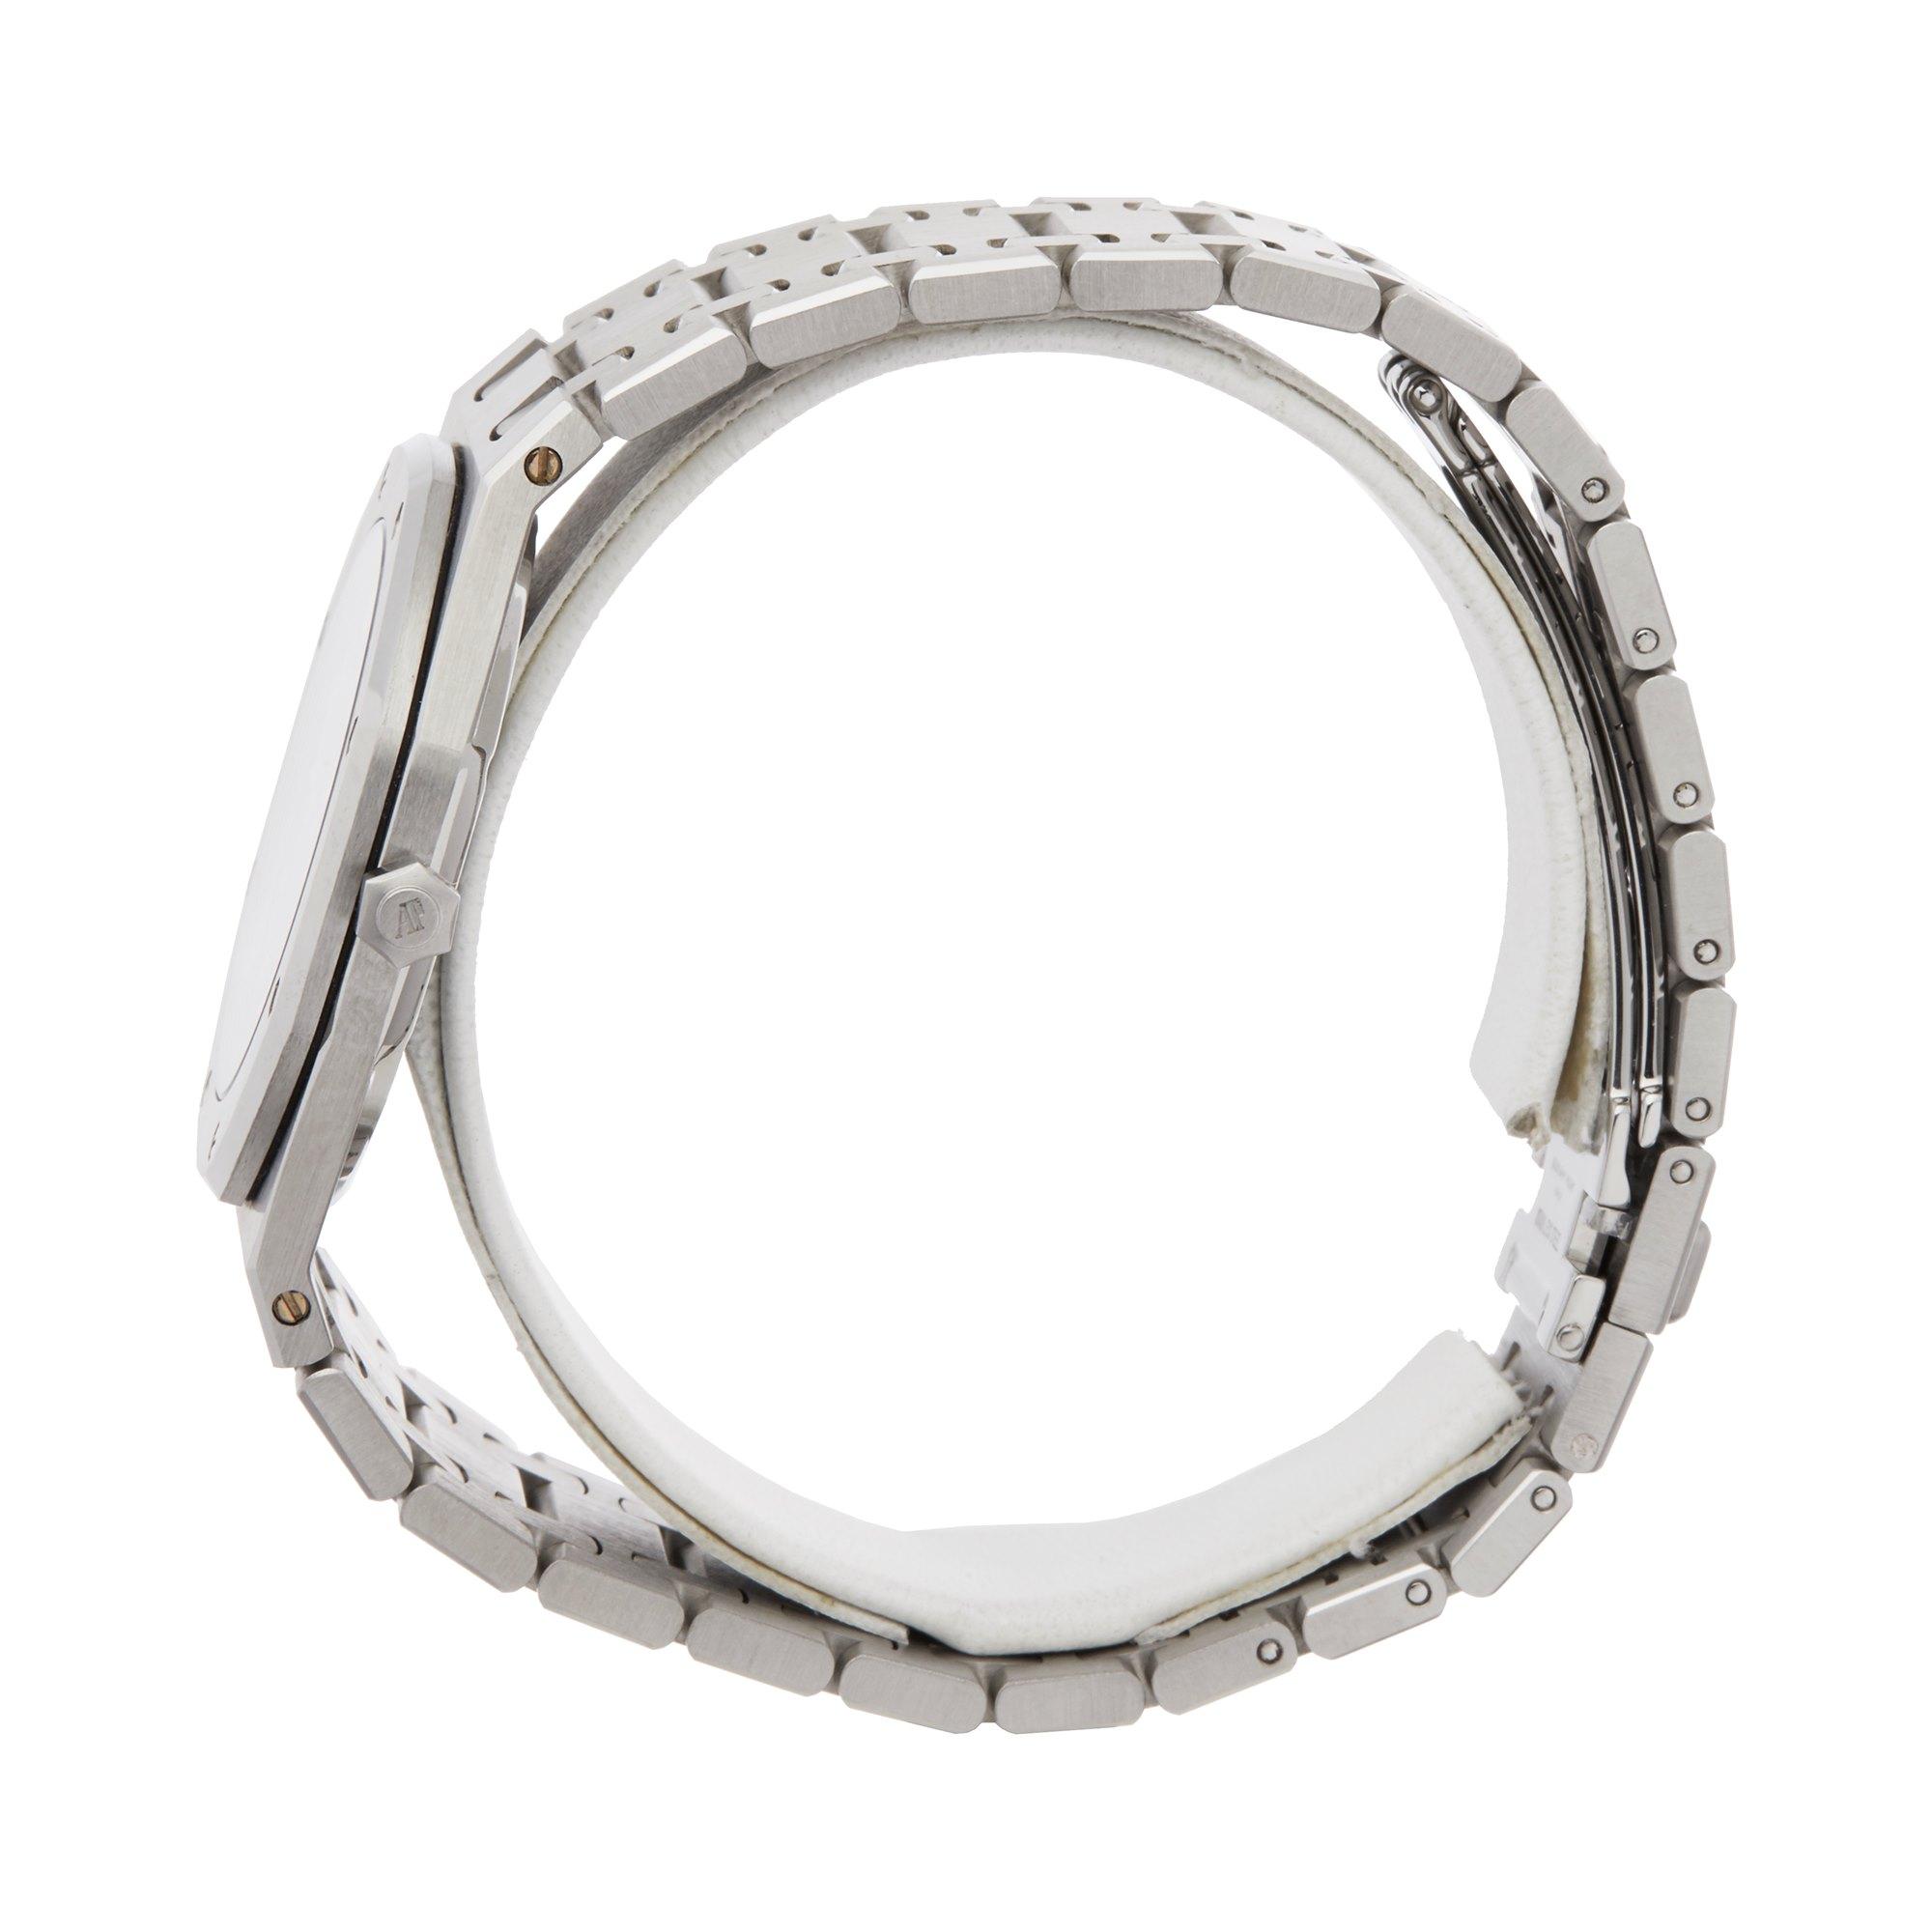 Audemars Piguet Royal Oak Lady Stainless Steel 57175ST.OO.0789ST.01